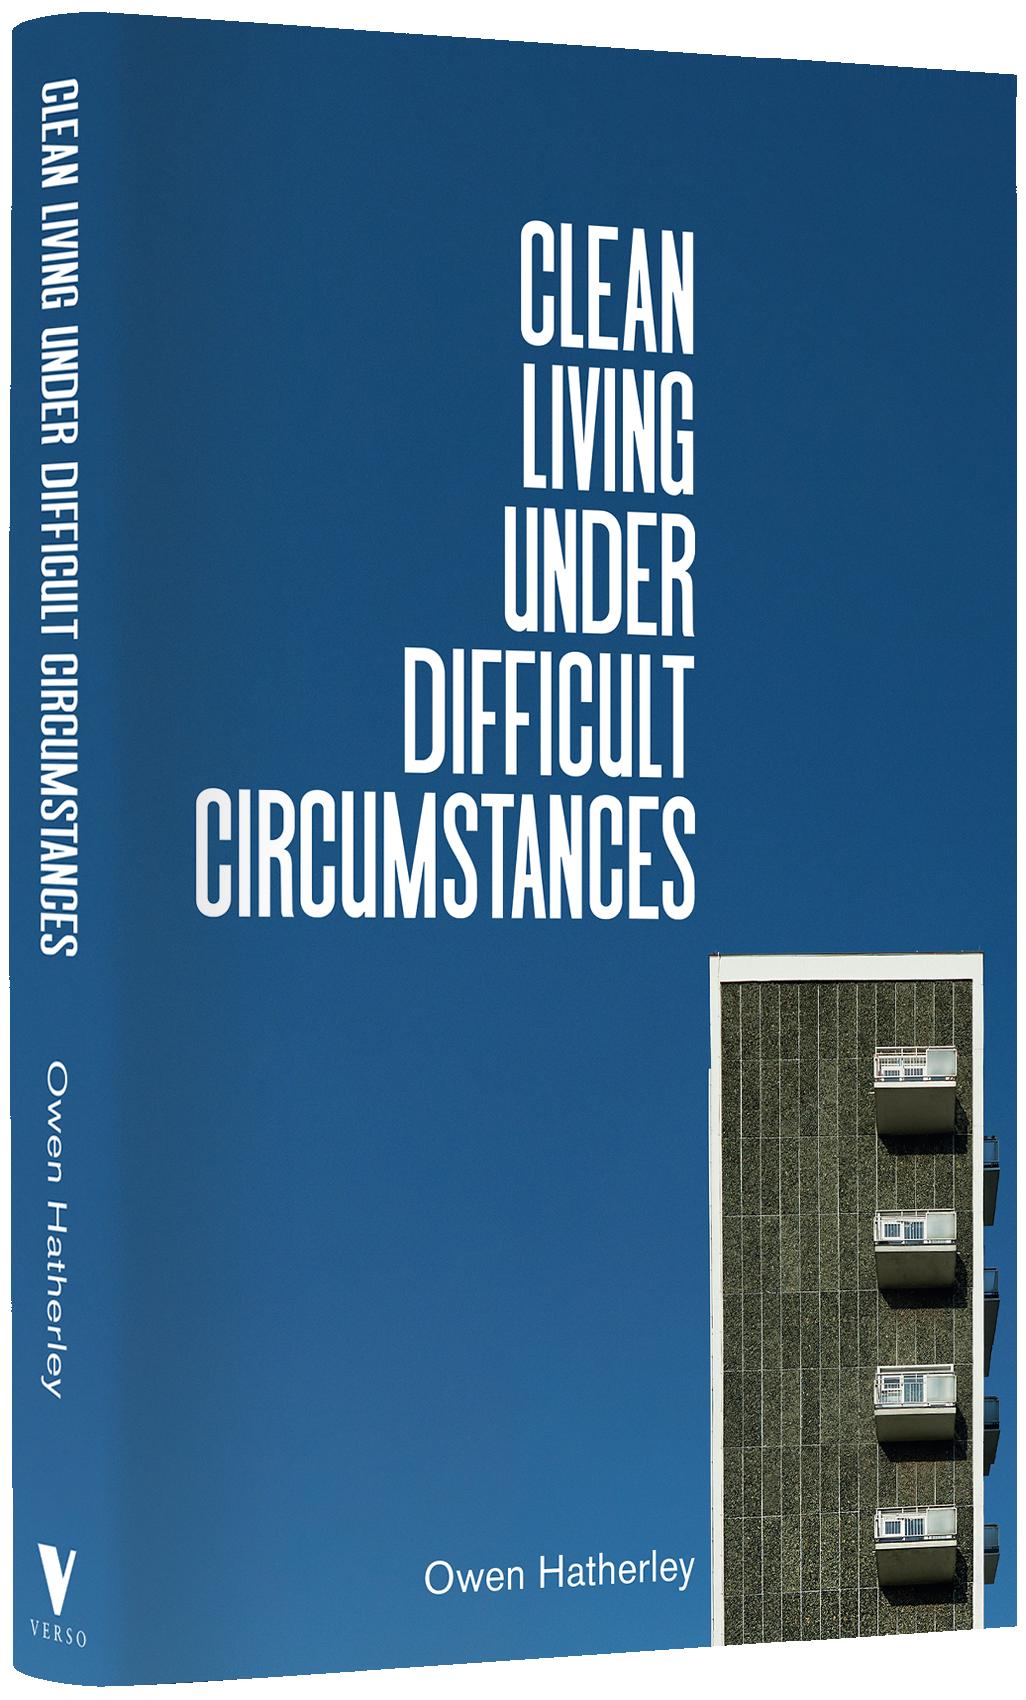 Clean-living-under-difficult-circumstances-hc